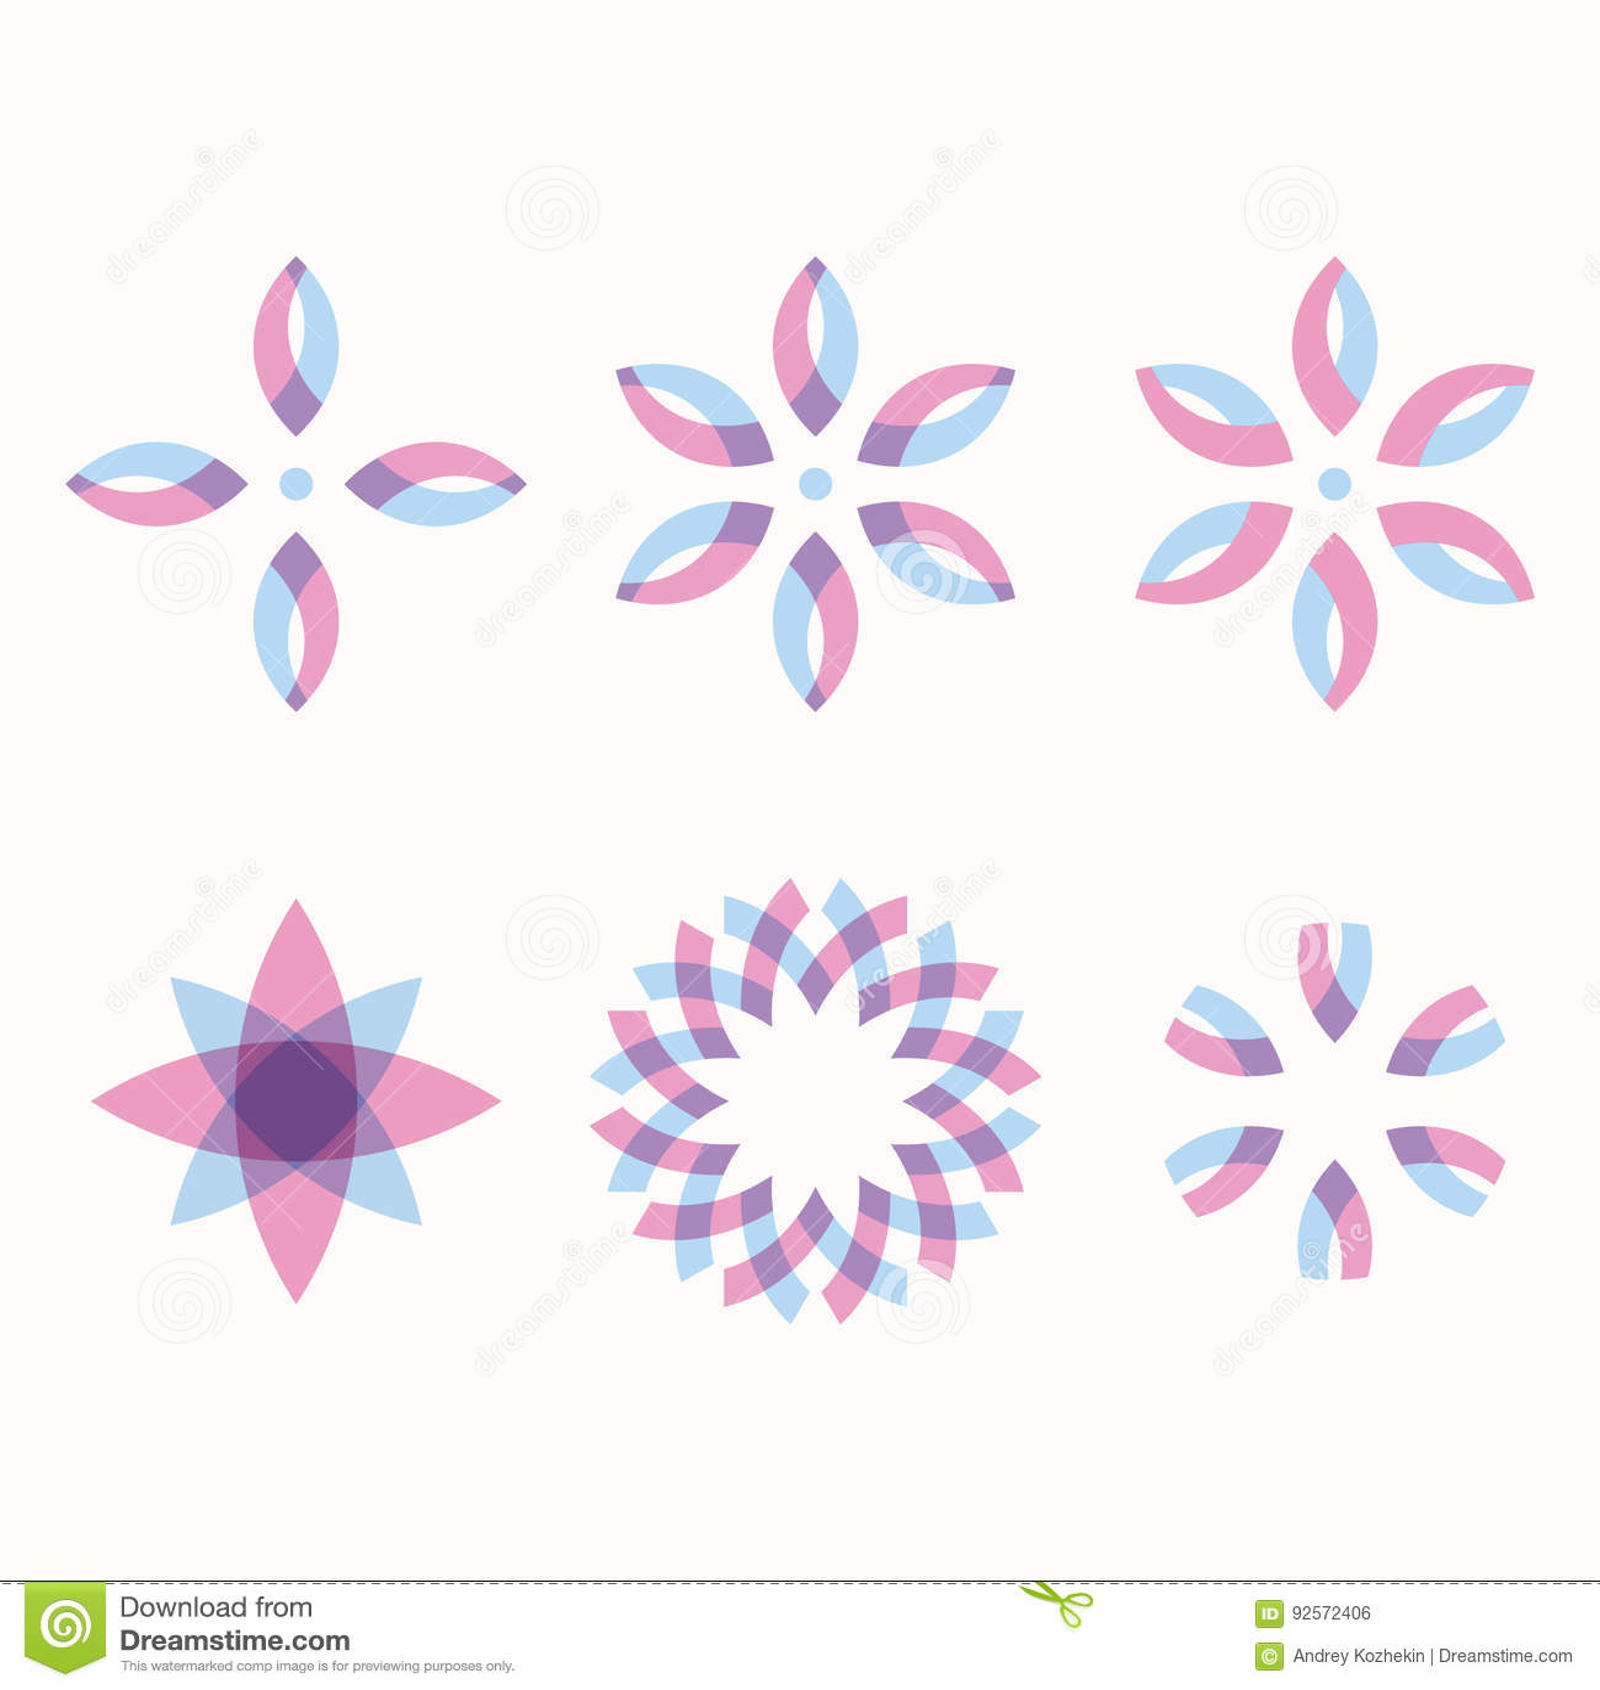 Un insieme di 6 forme geometriche simmetriche